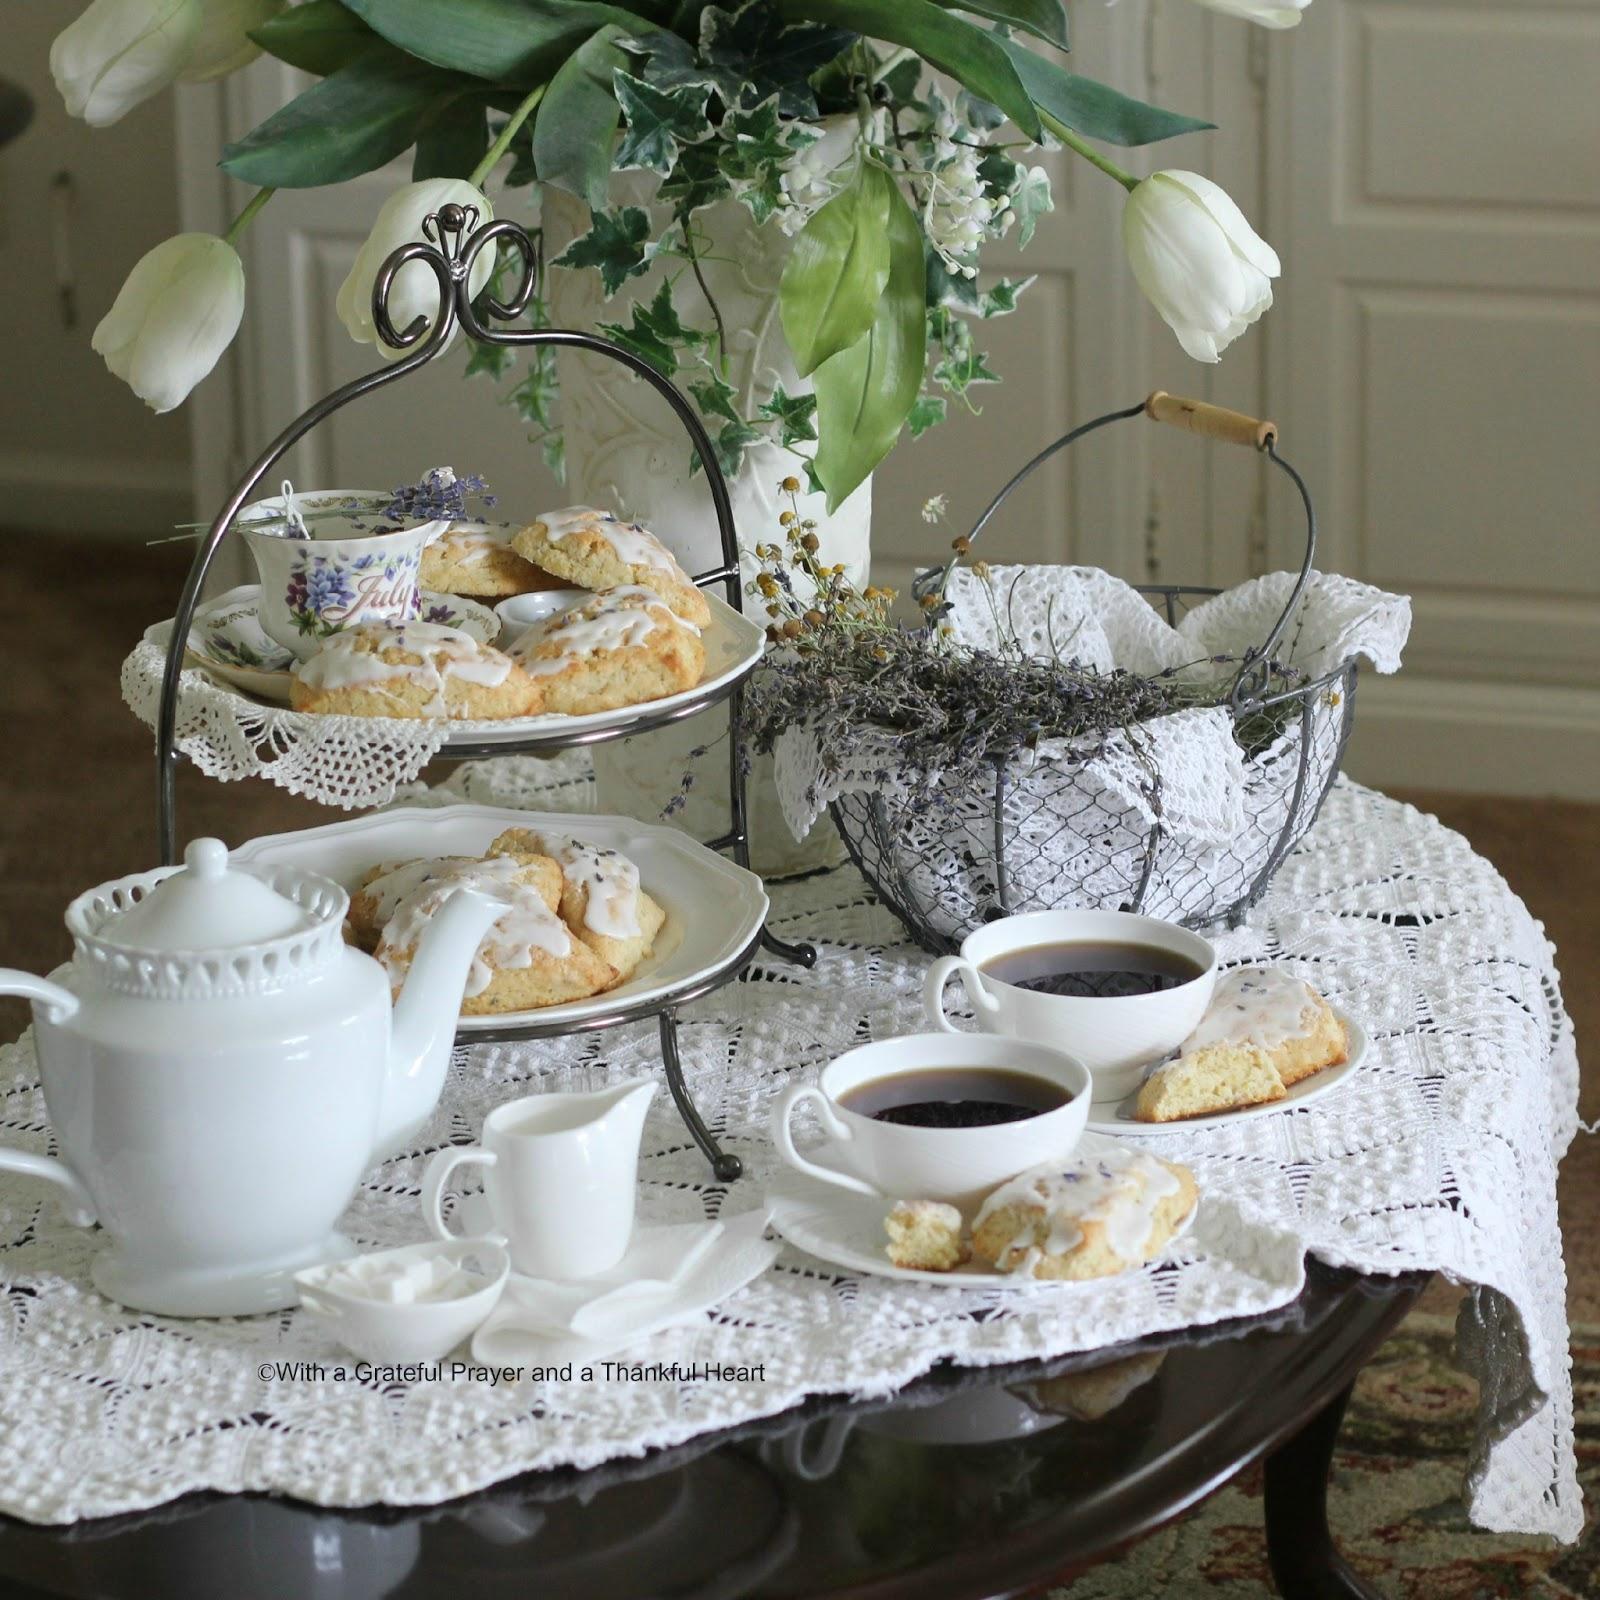 Sweet Lavender Scones in the Parlor | Grateful Prayer ...